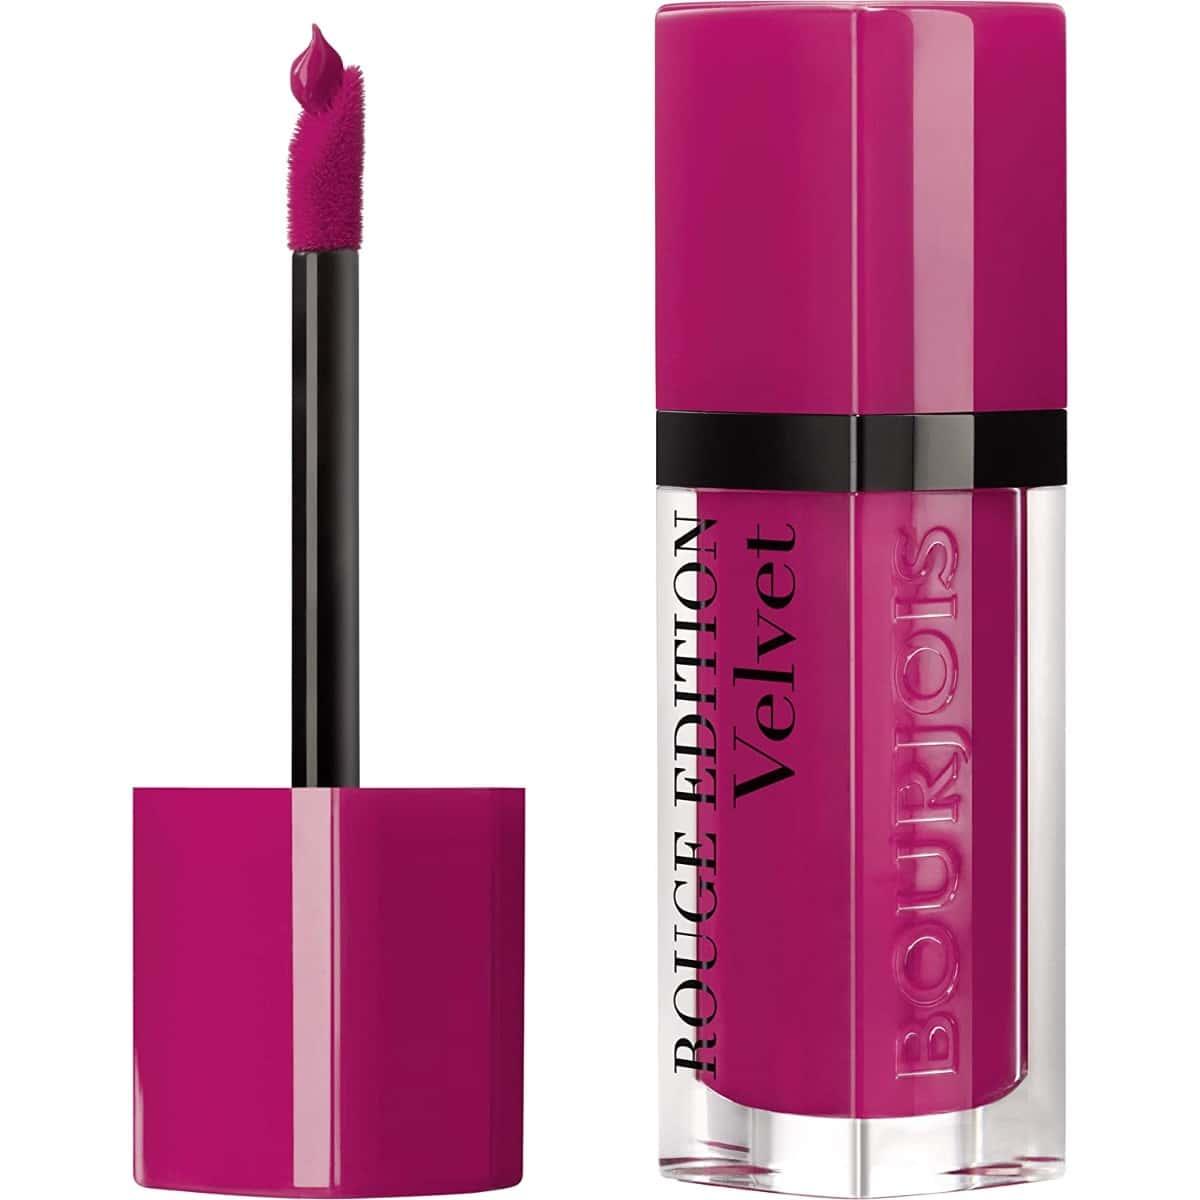 Bourjois Rouge Edition Velvet Lipstick 06 Pink Pong